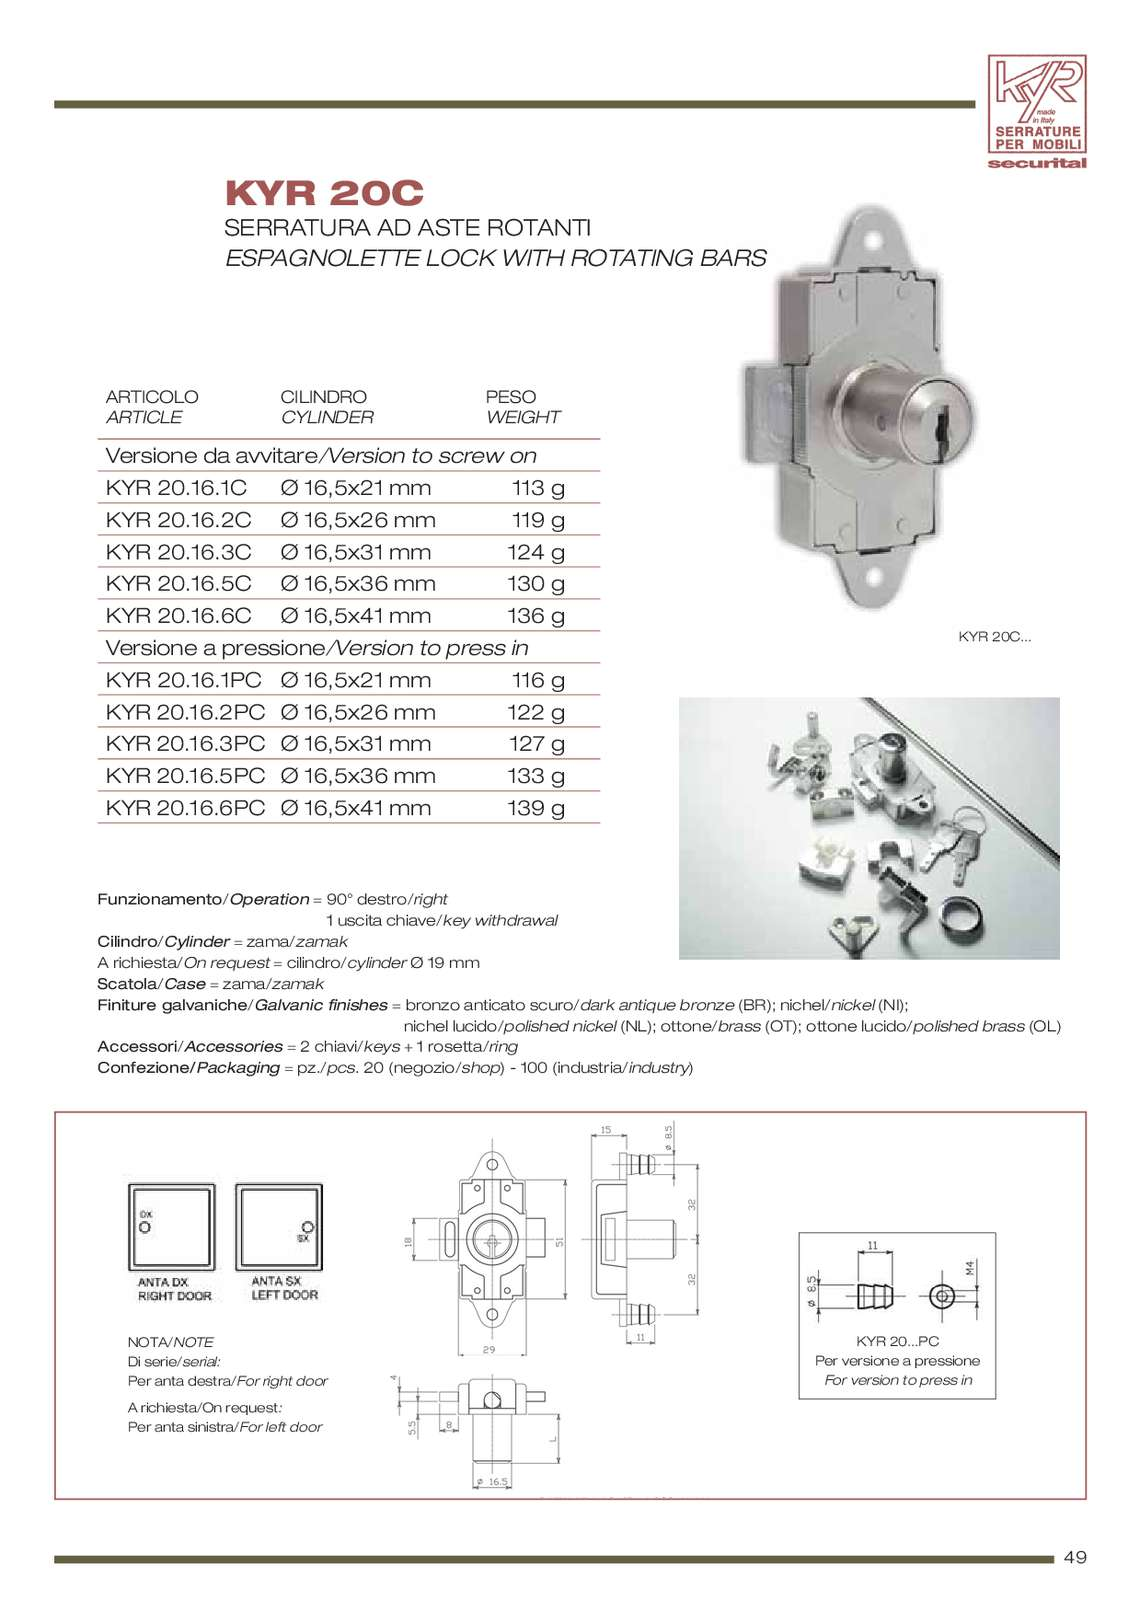 Catalogo securital serrature per mobili di securital for Catalogo di mobili